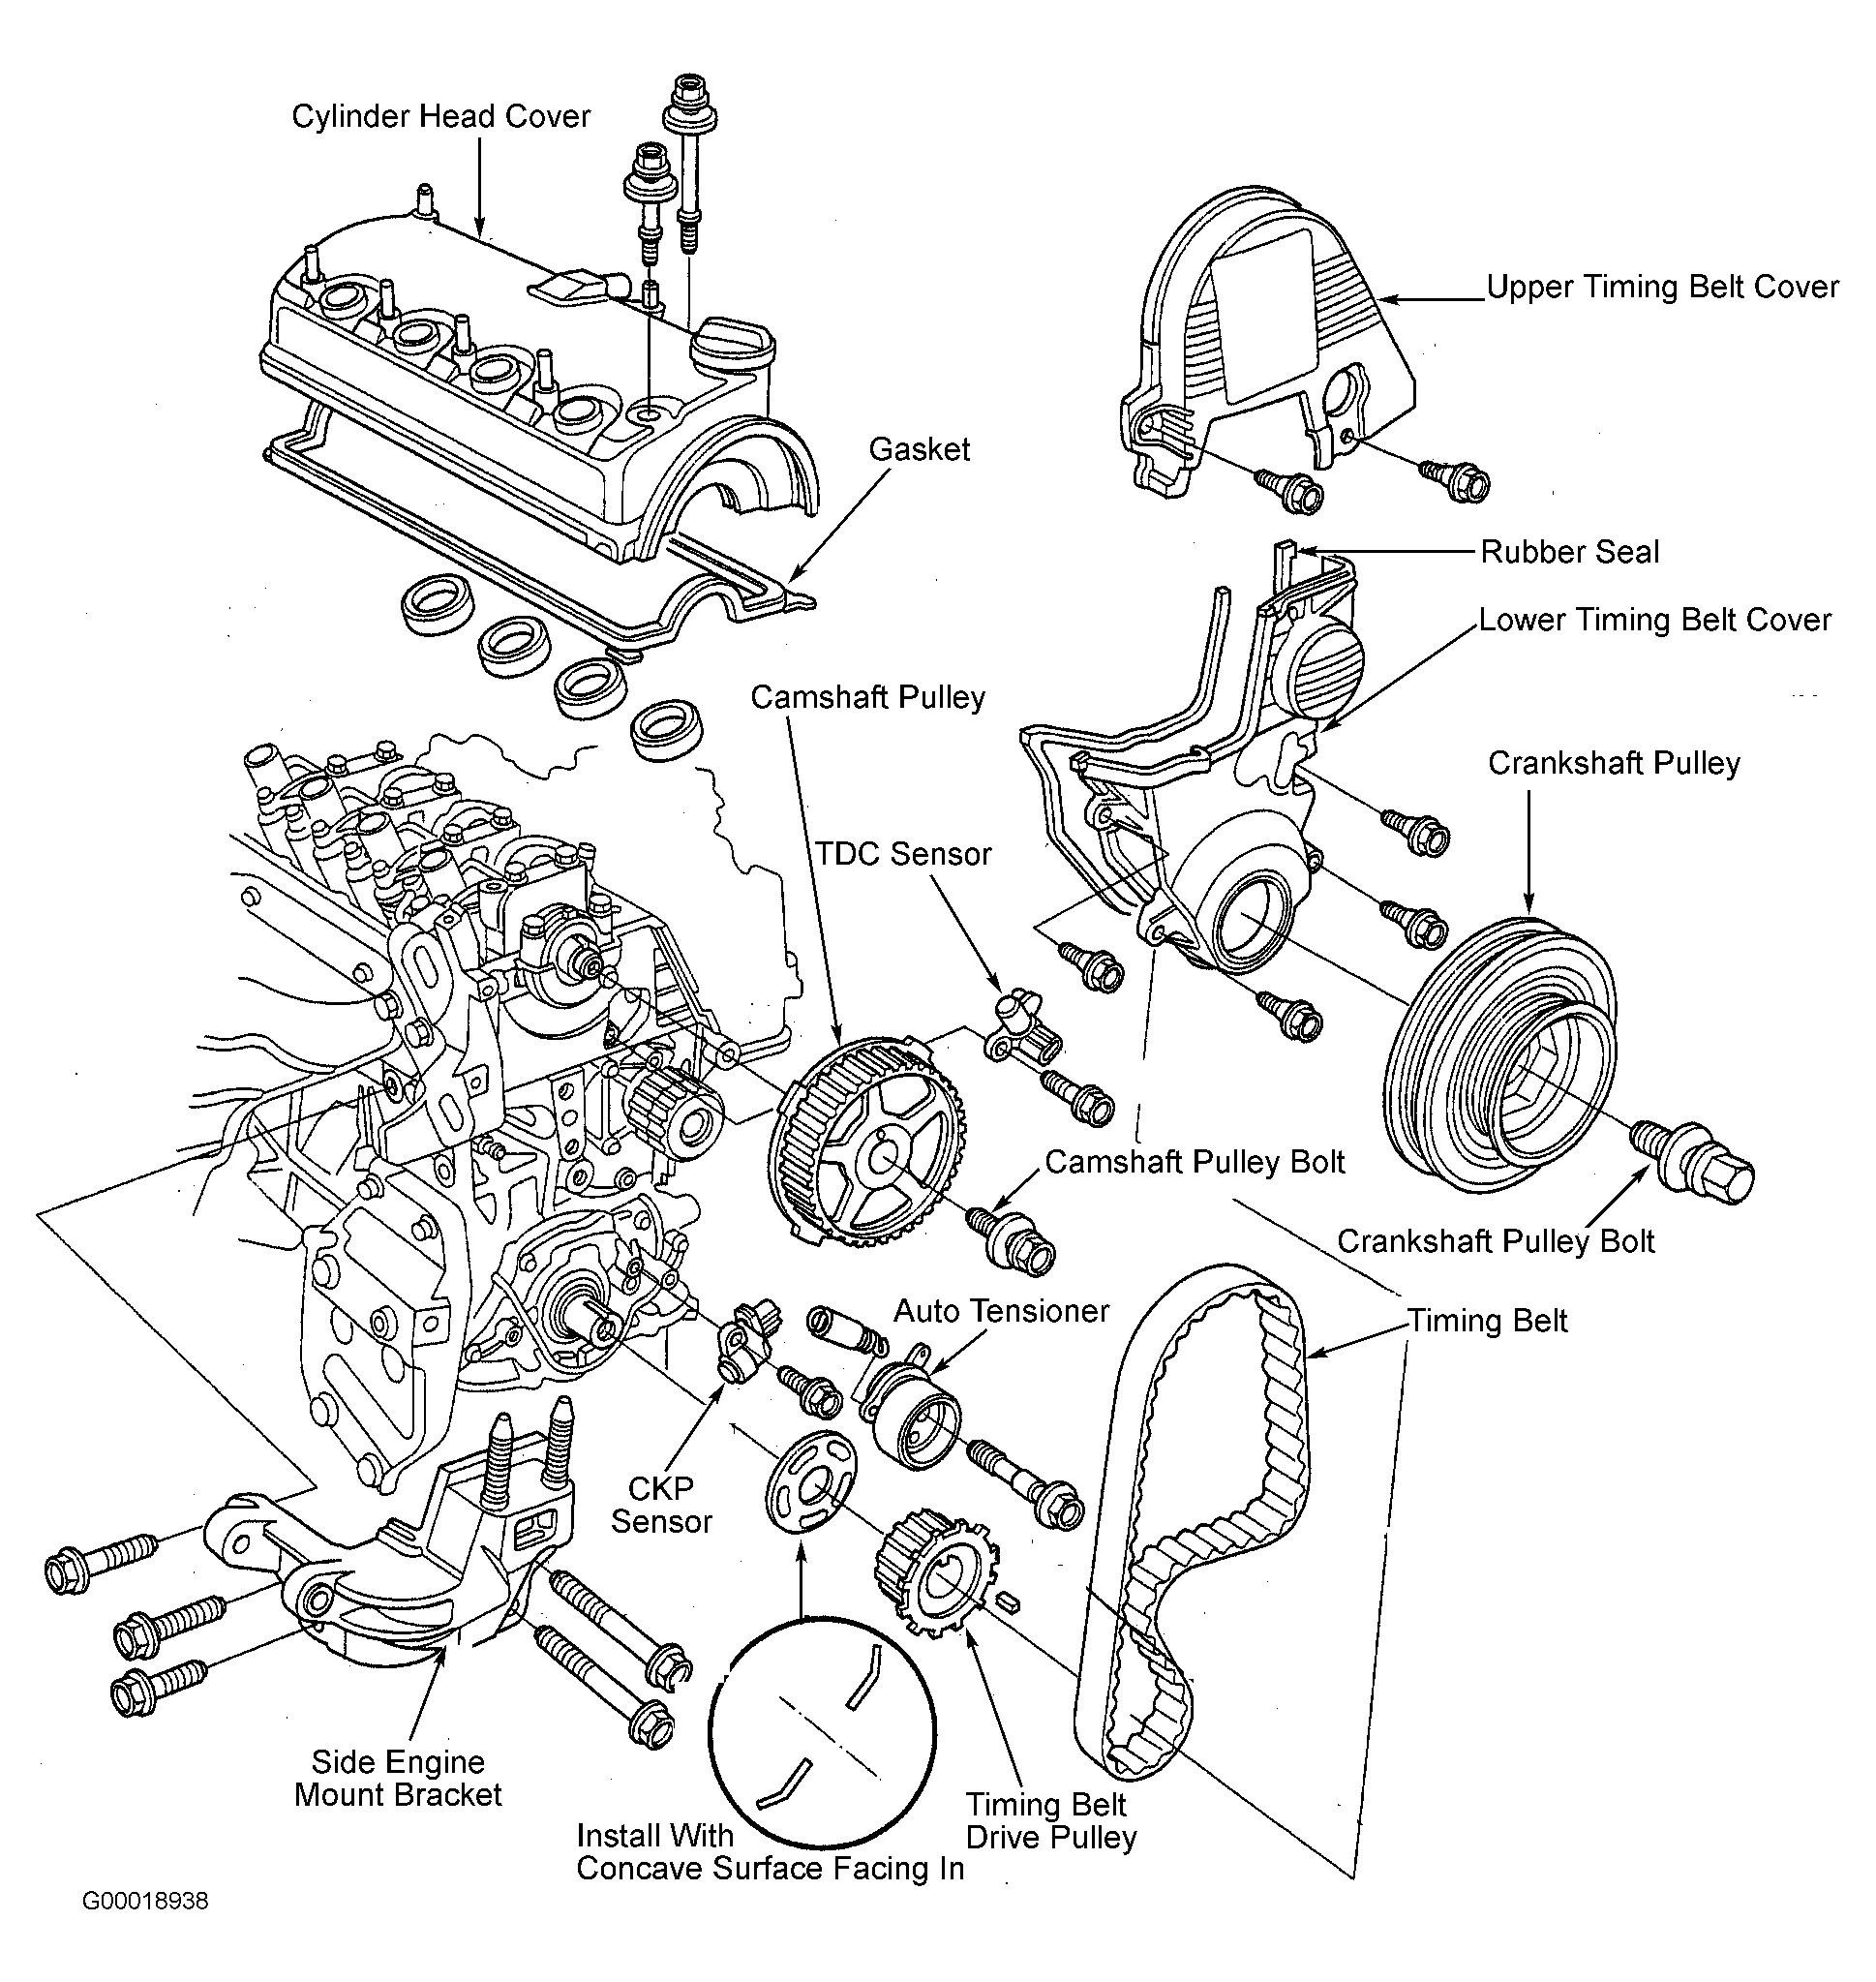 Diagram of honda civic engine honda civic engine diagram honda civic parts diagram wonderful of diagram